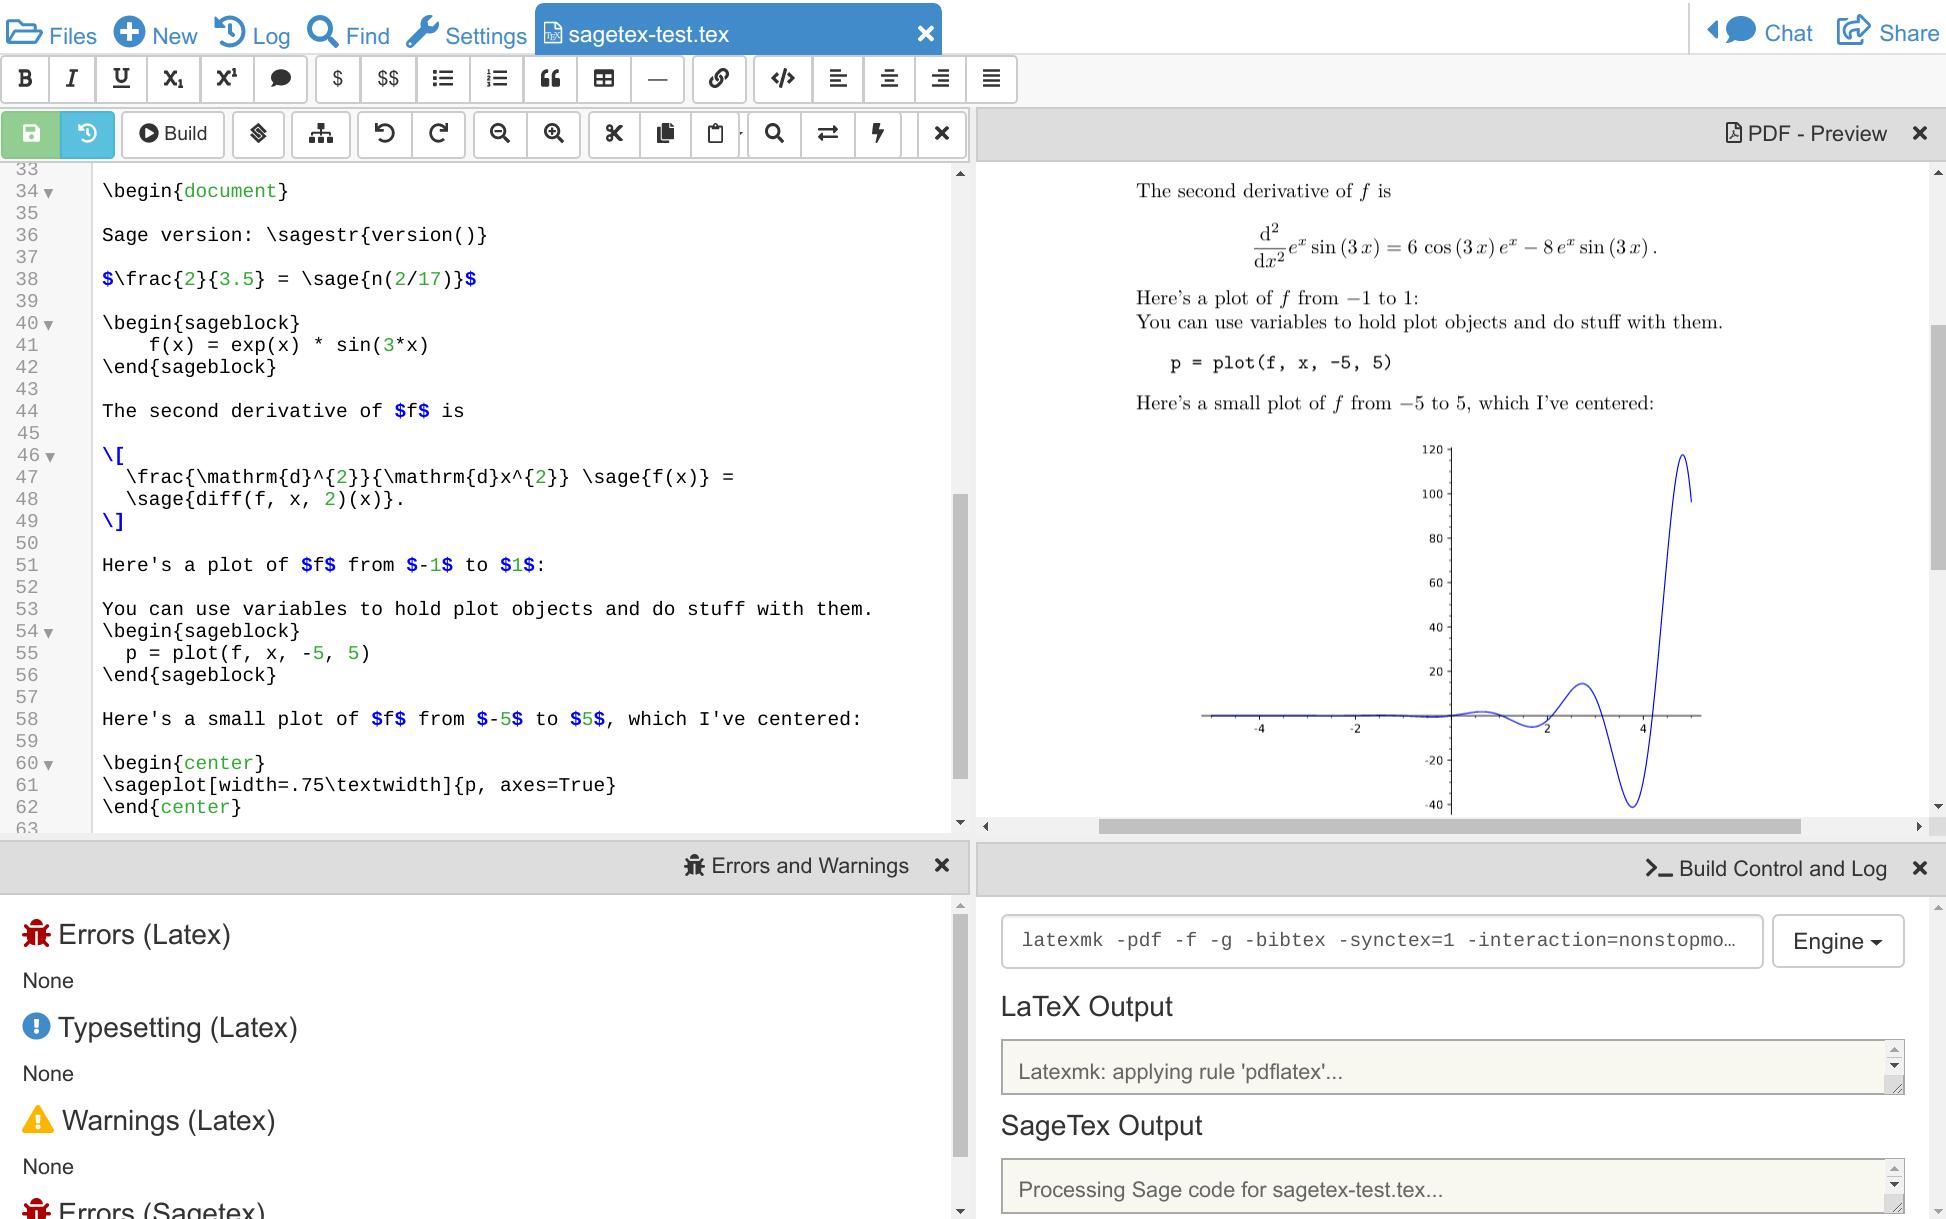 CoCalc - Online LaTeX Editor